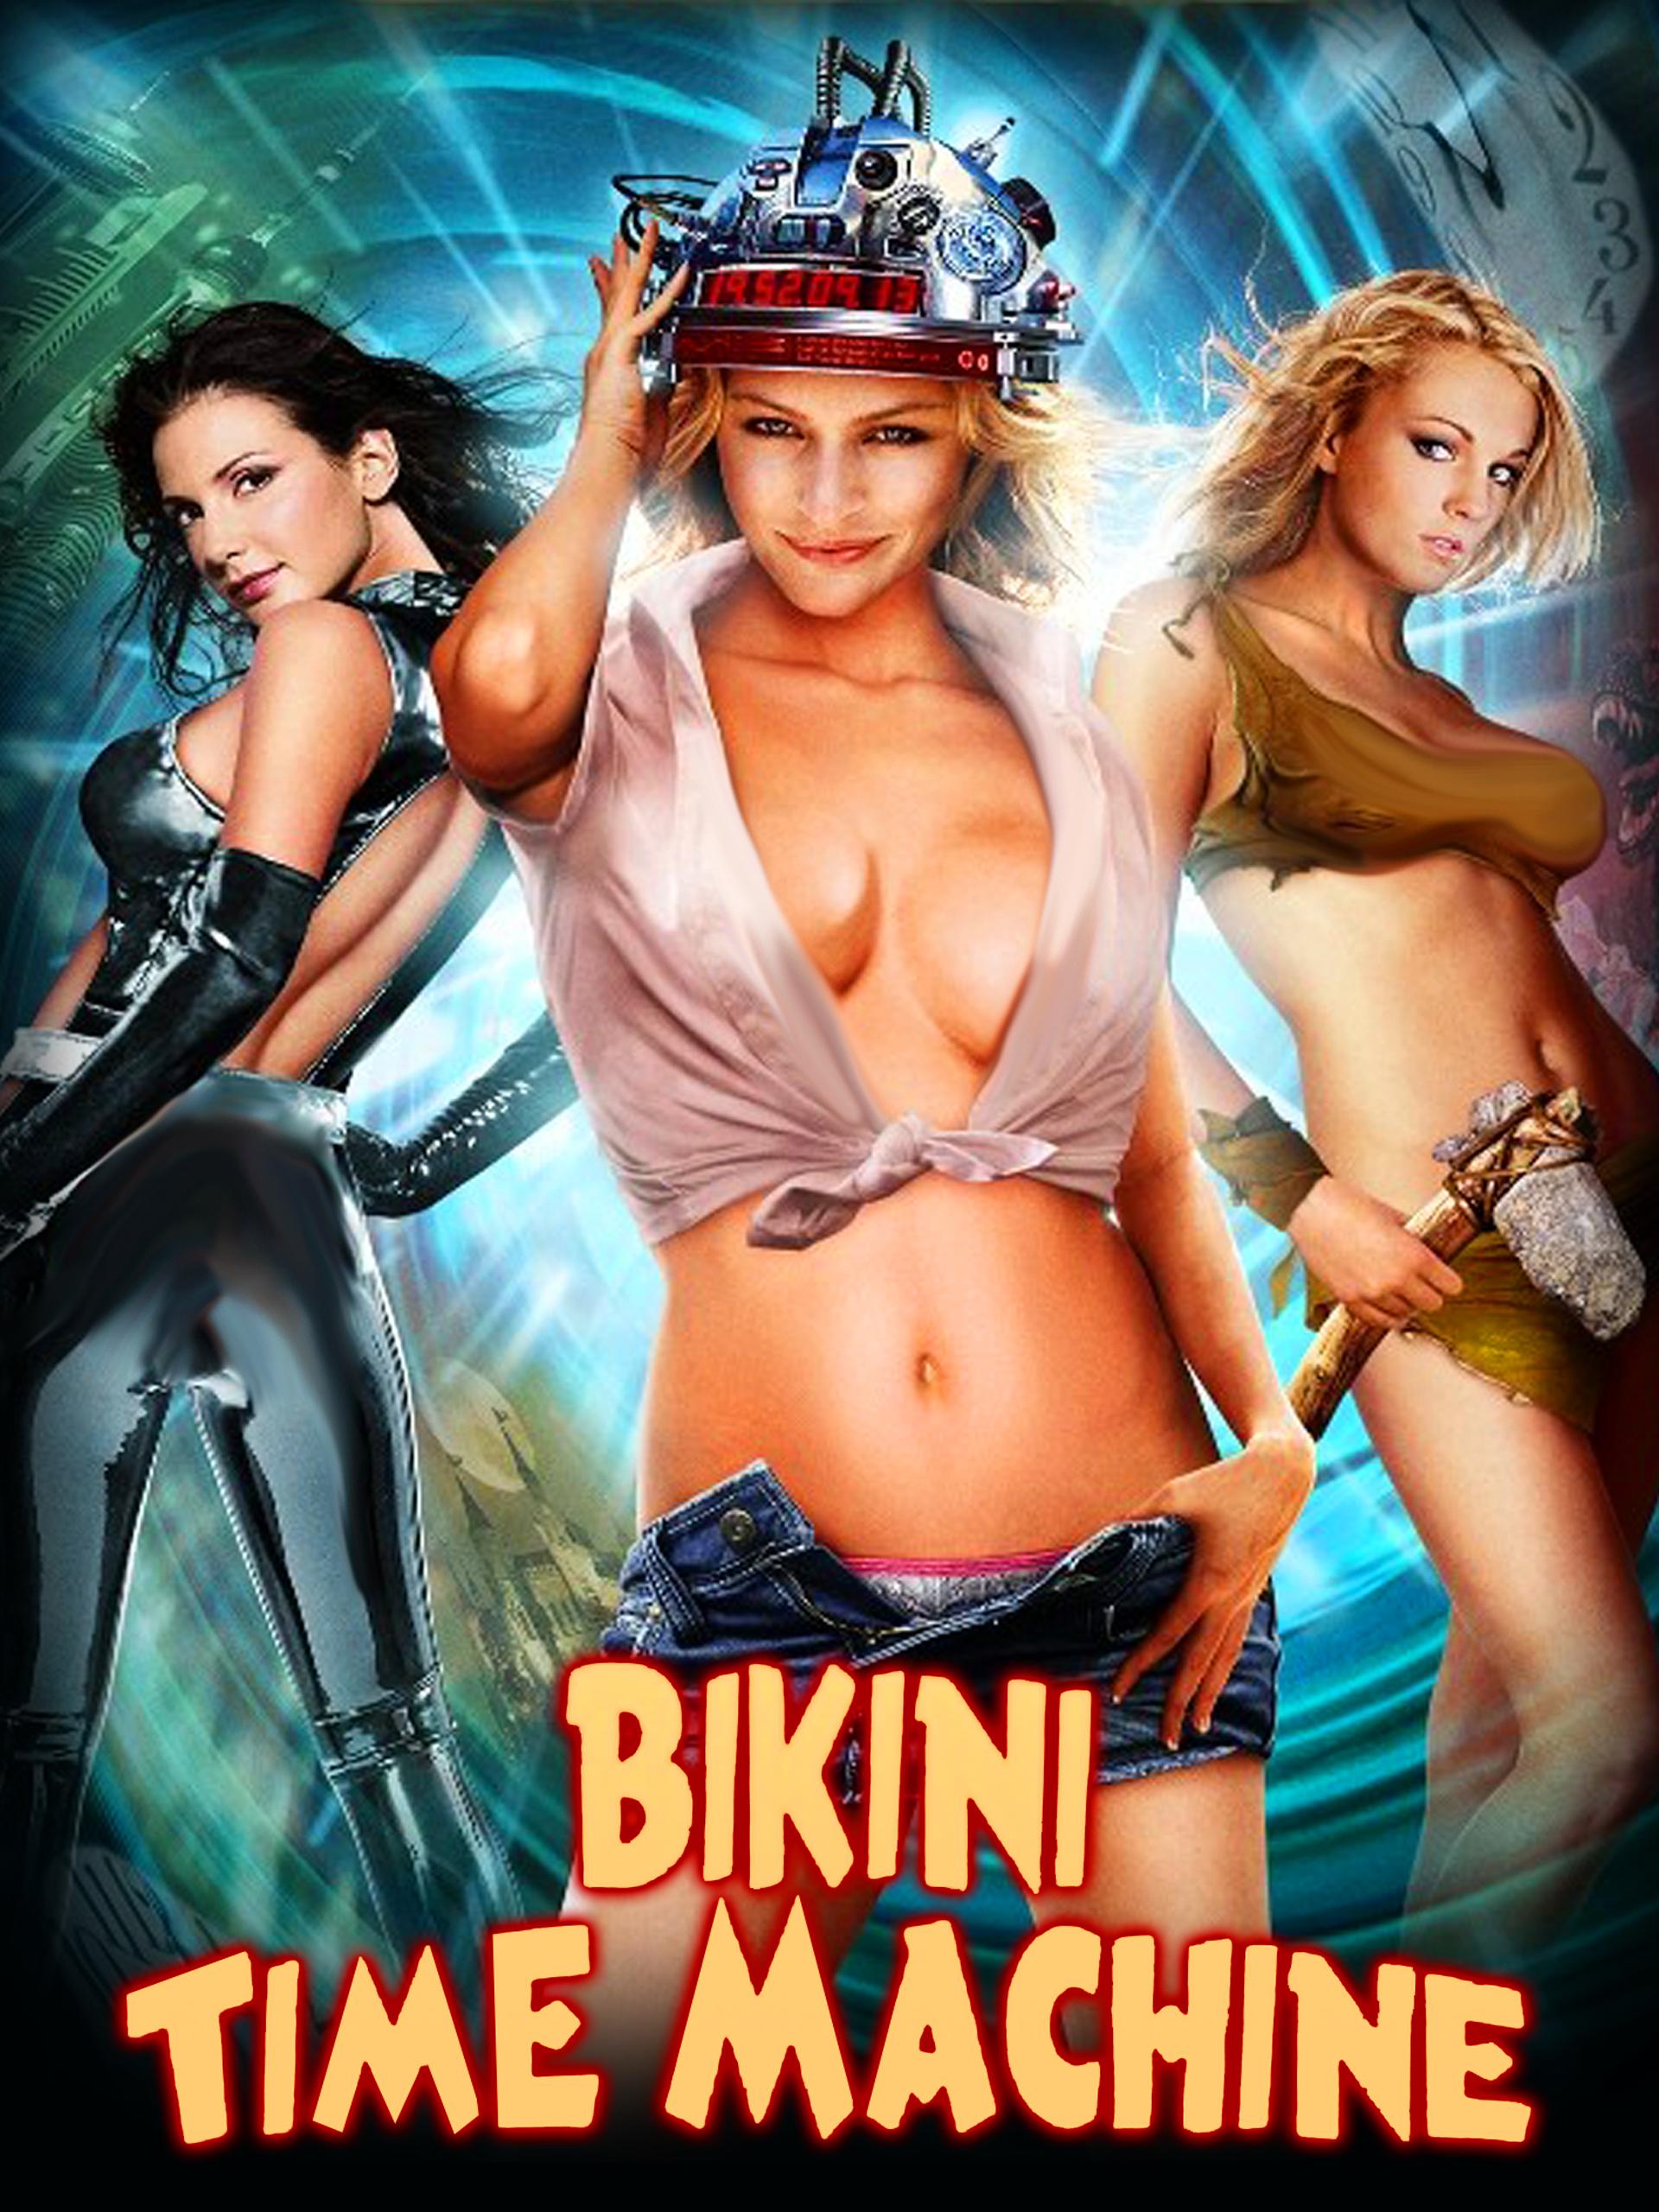 fullmoon-bikinitimemachine-Full-Image-en-US-forDE